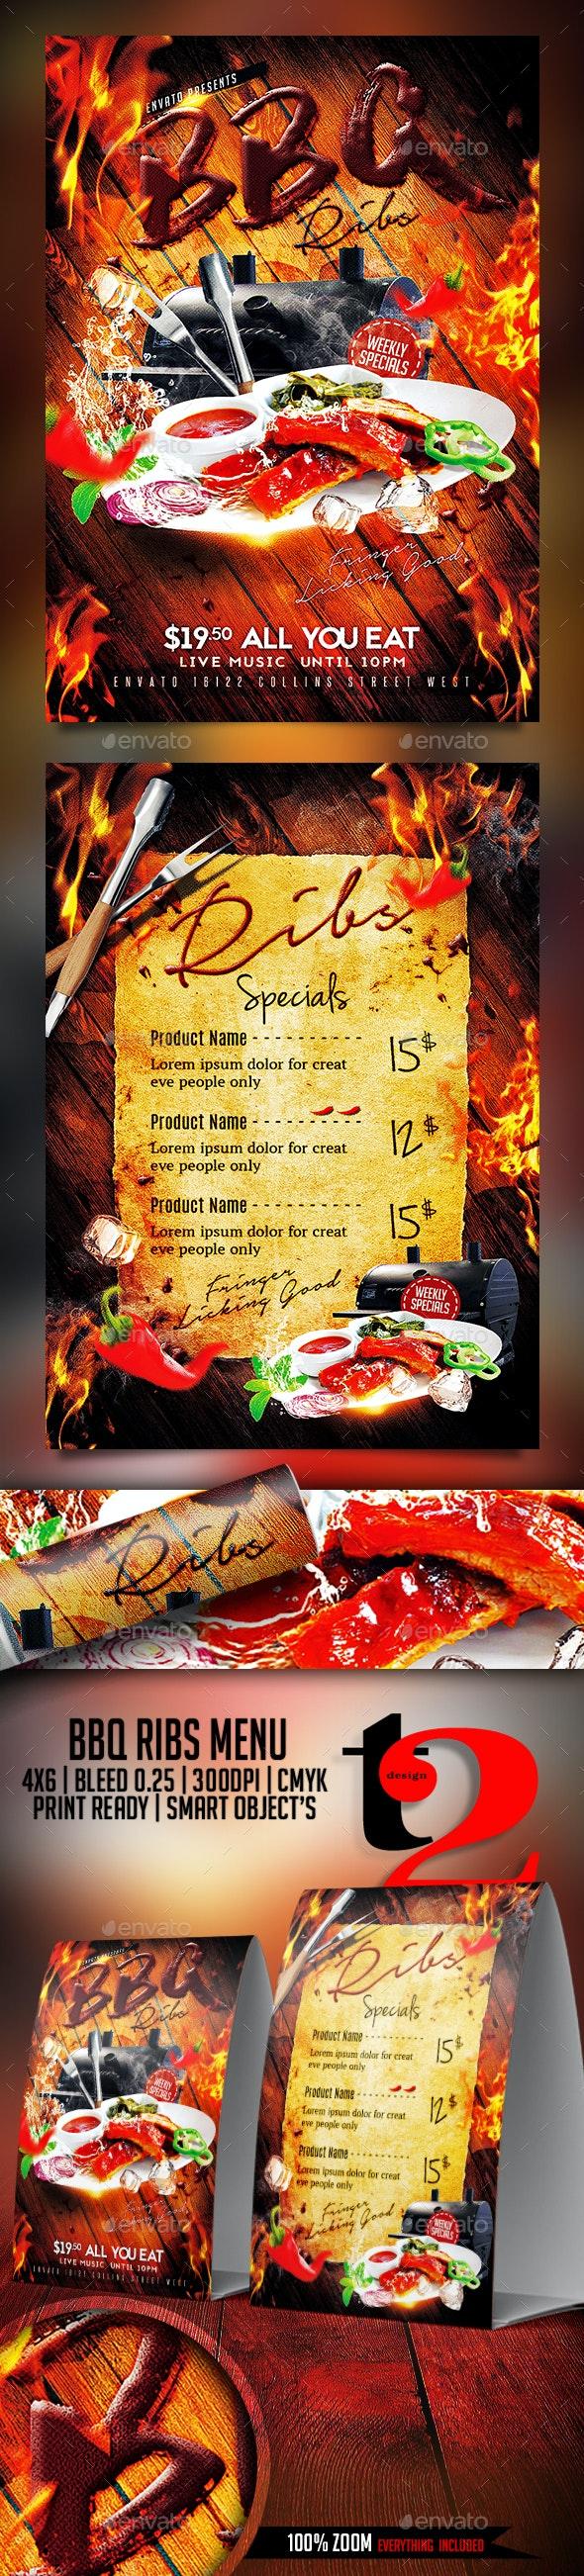 BBQ Ribs Menu Template - Restaurant Flyers